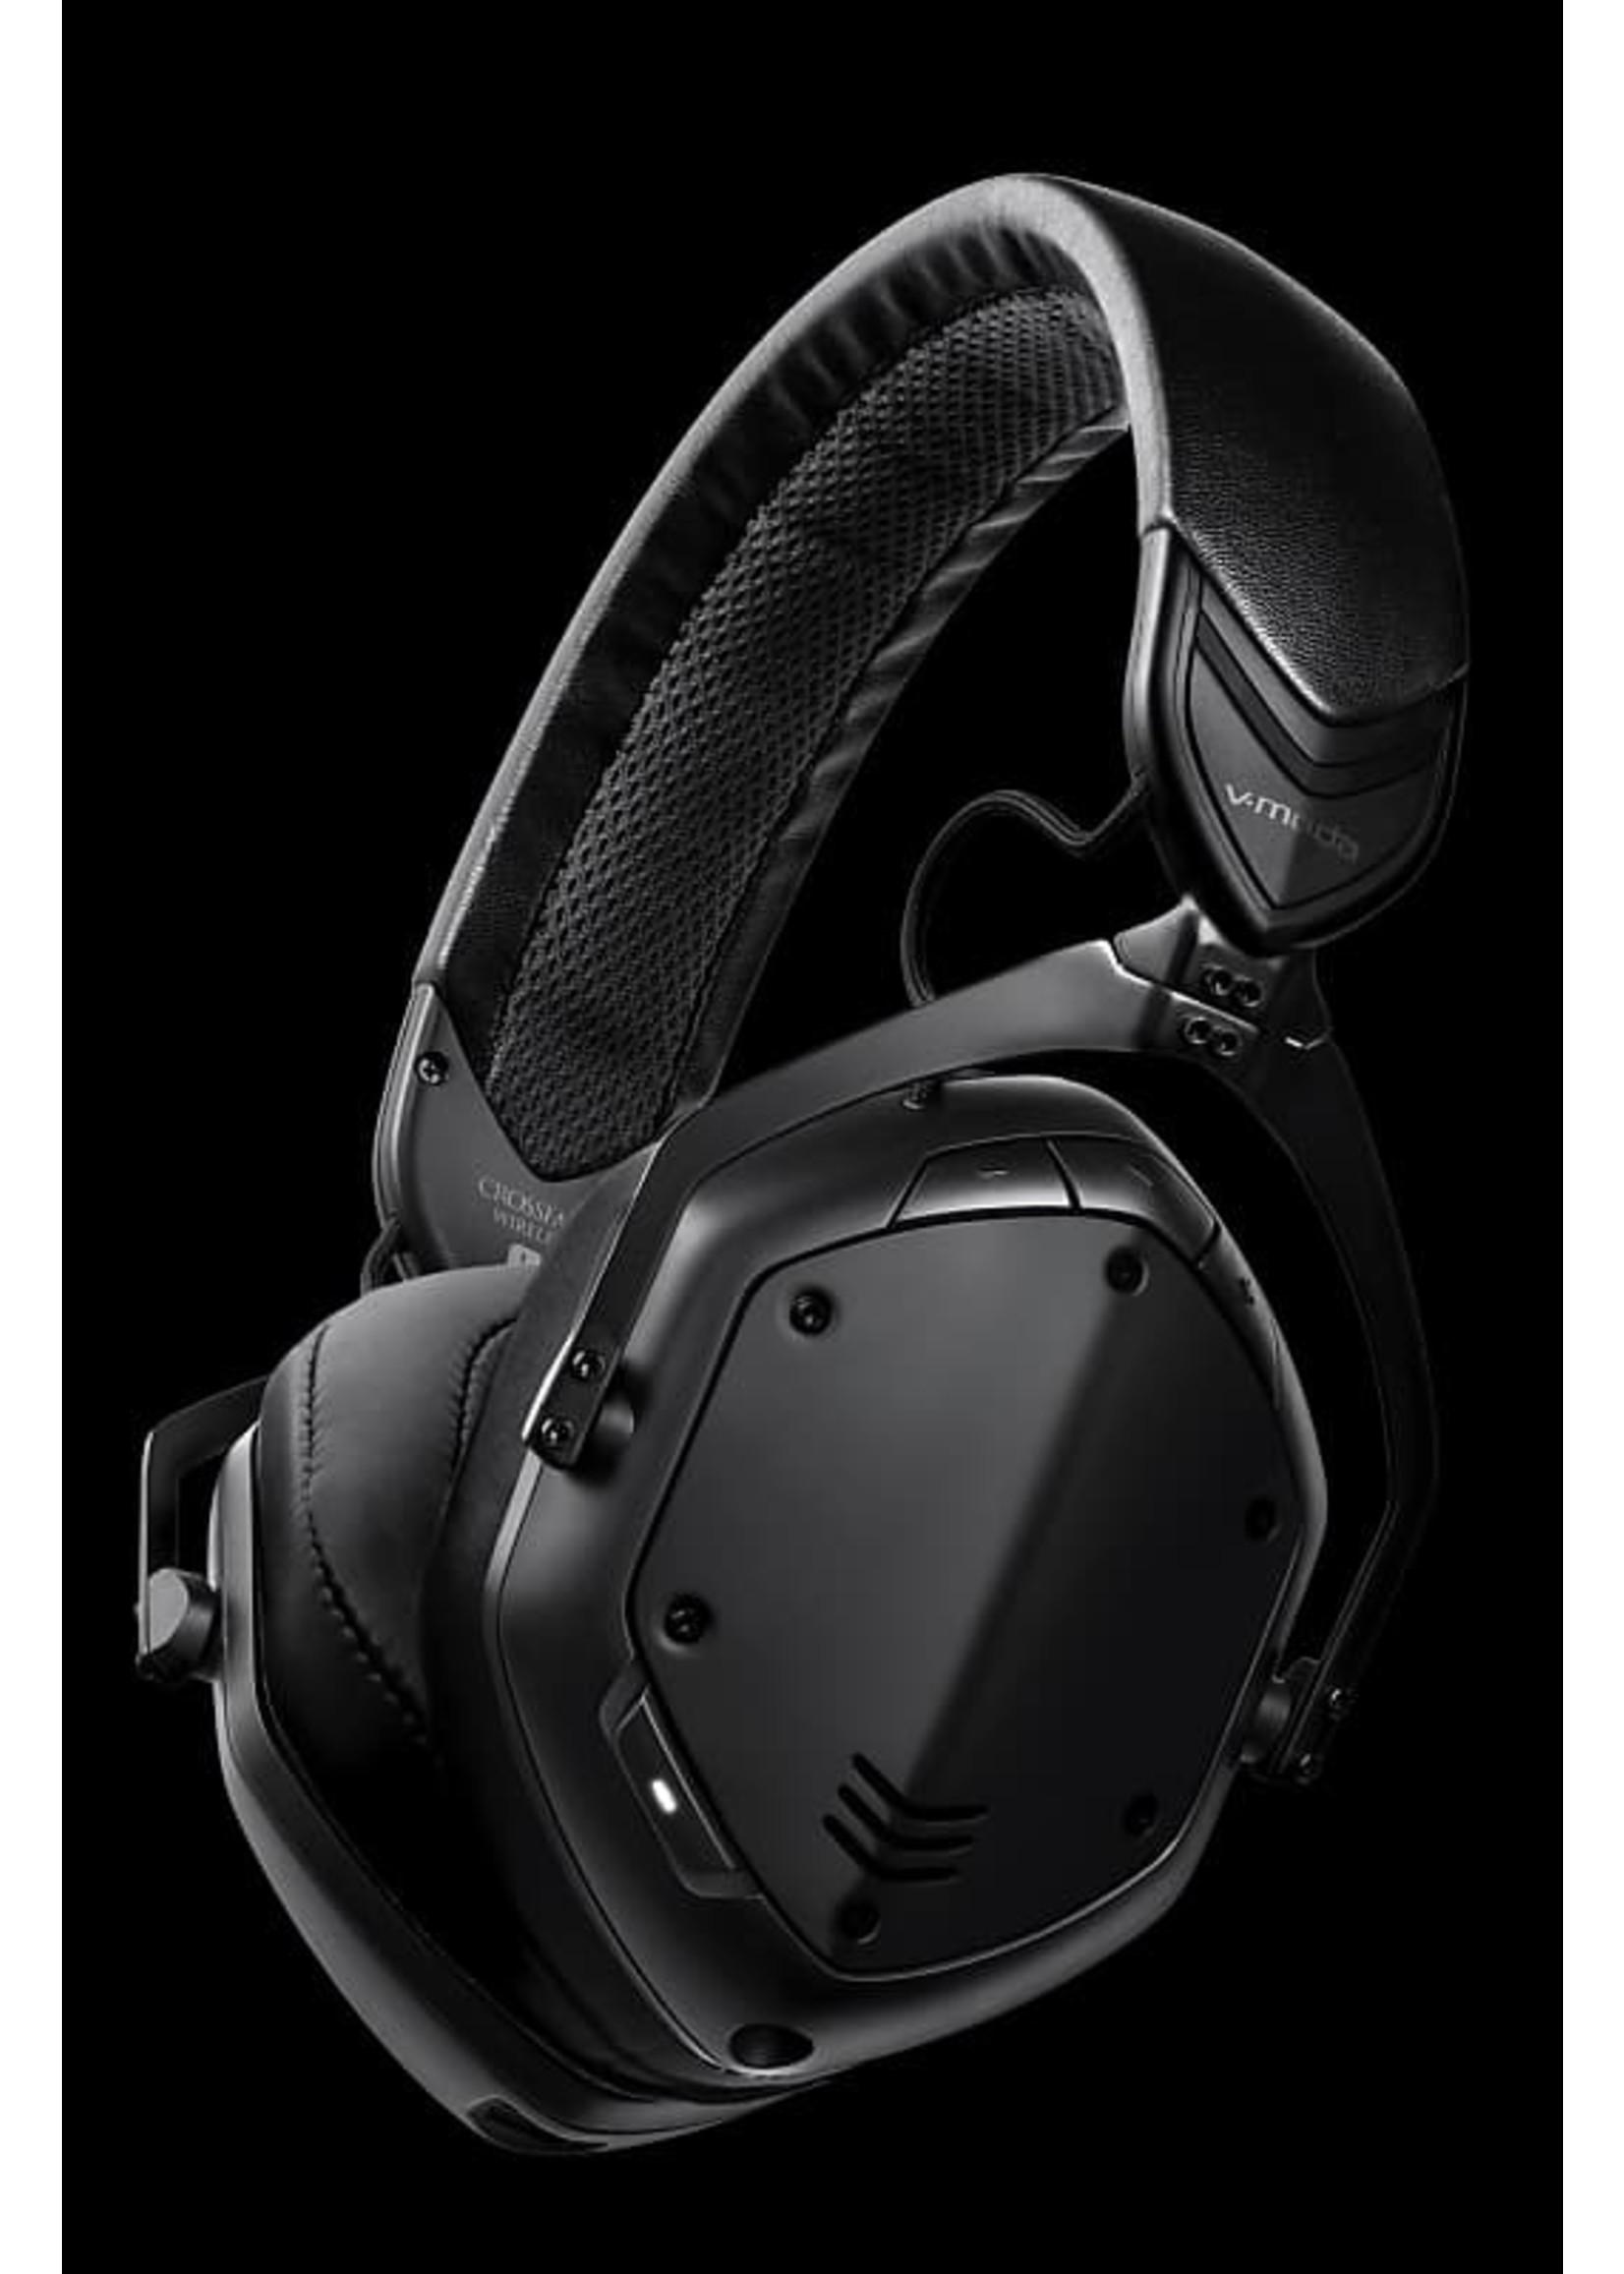 V-MODA Moda XFBT2A-MBLACK Crossfade 2 Wireless Codex Headphones